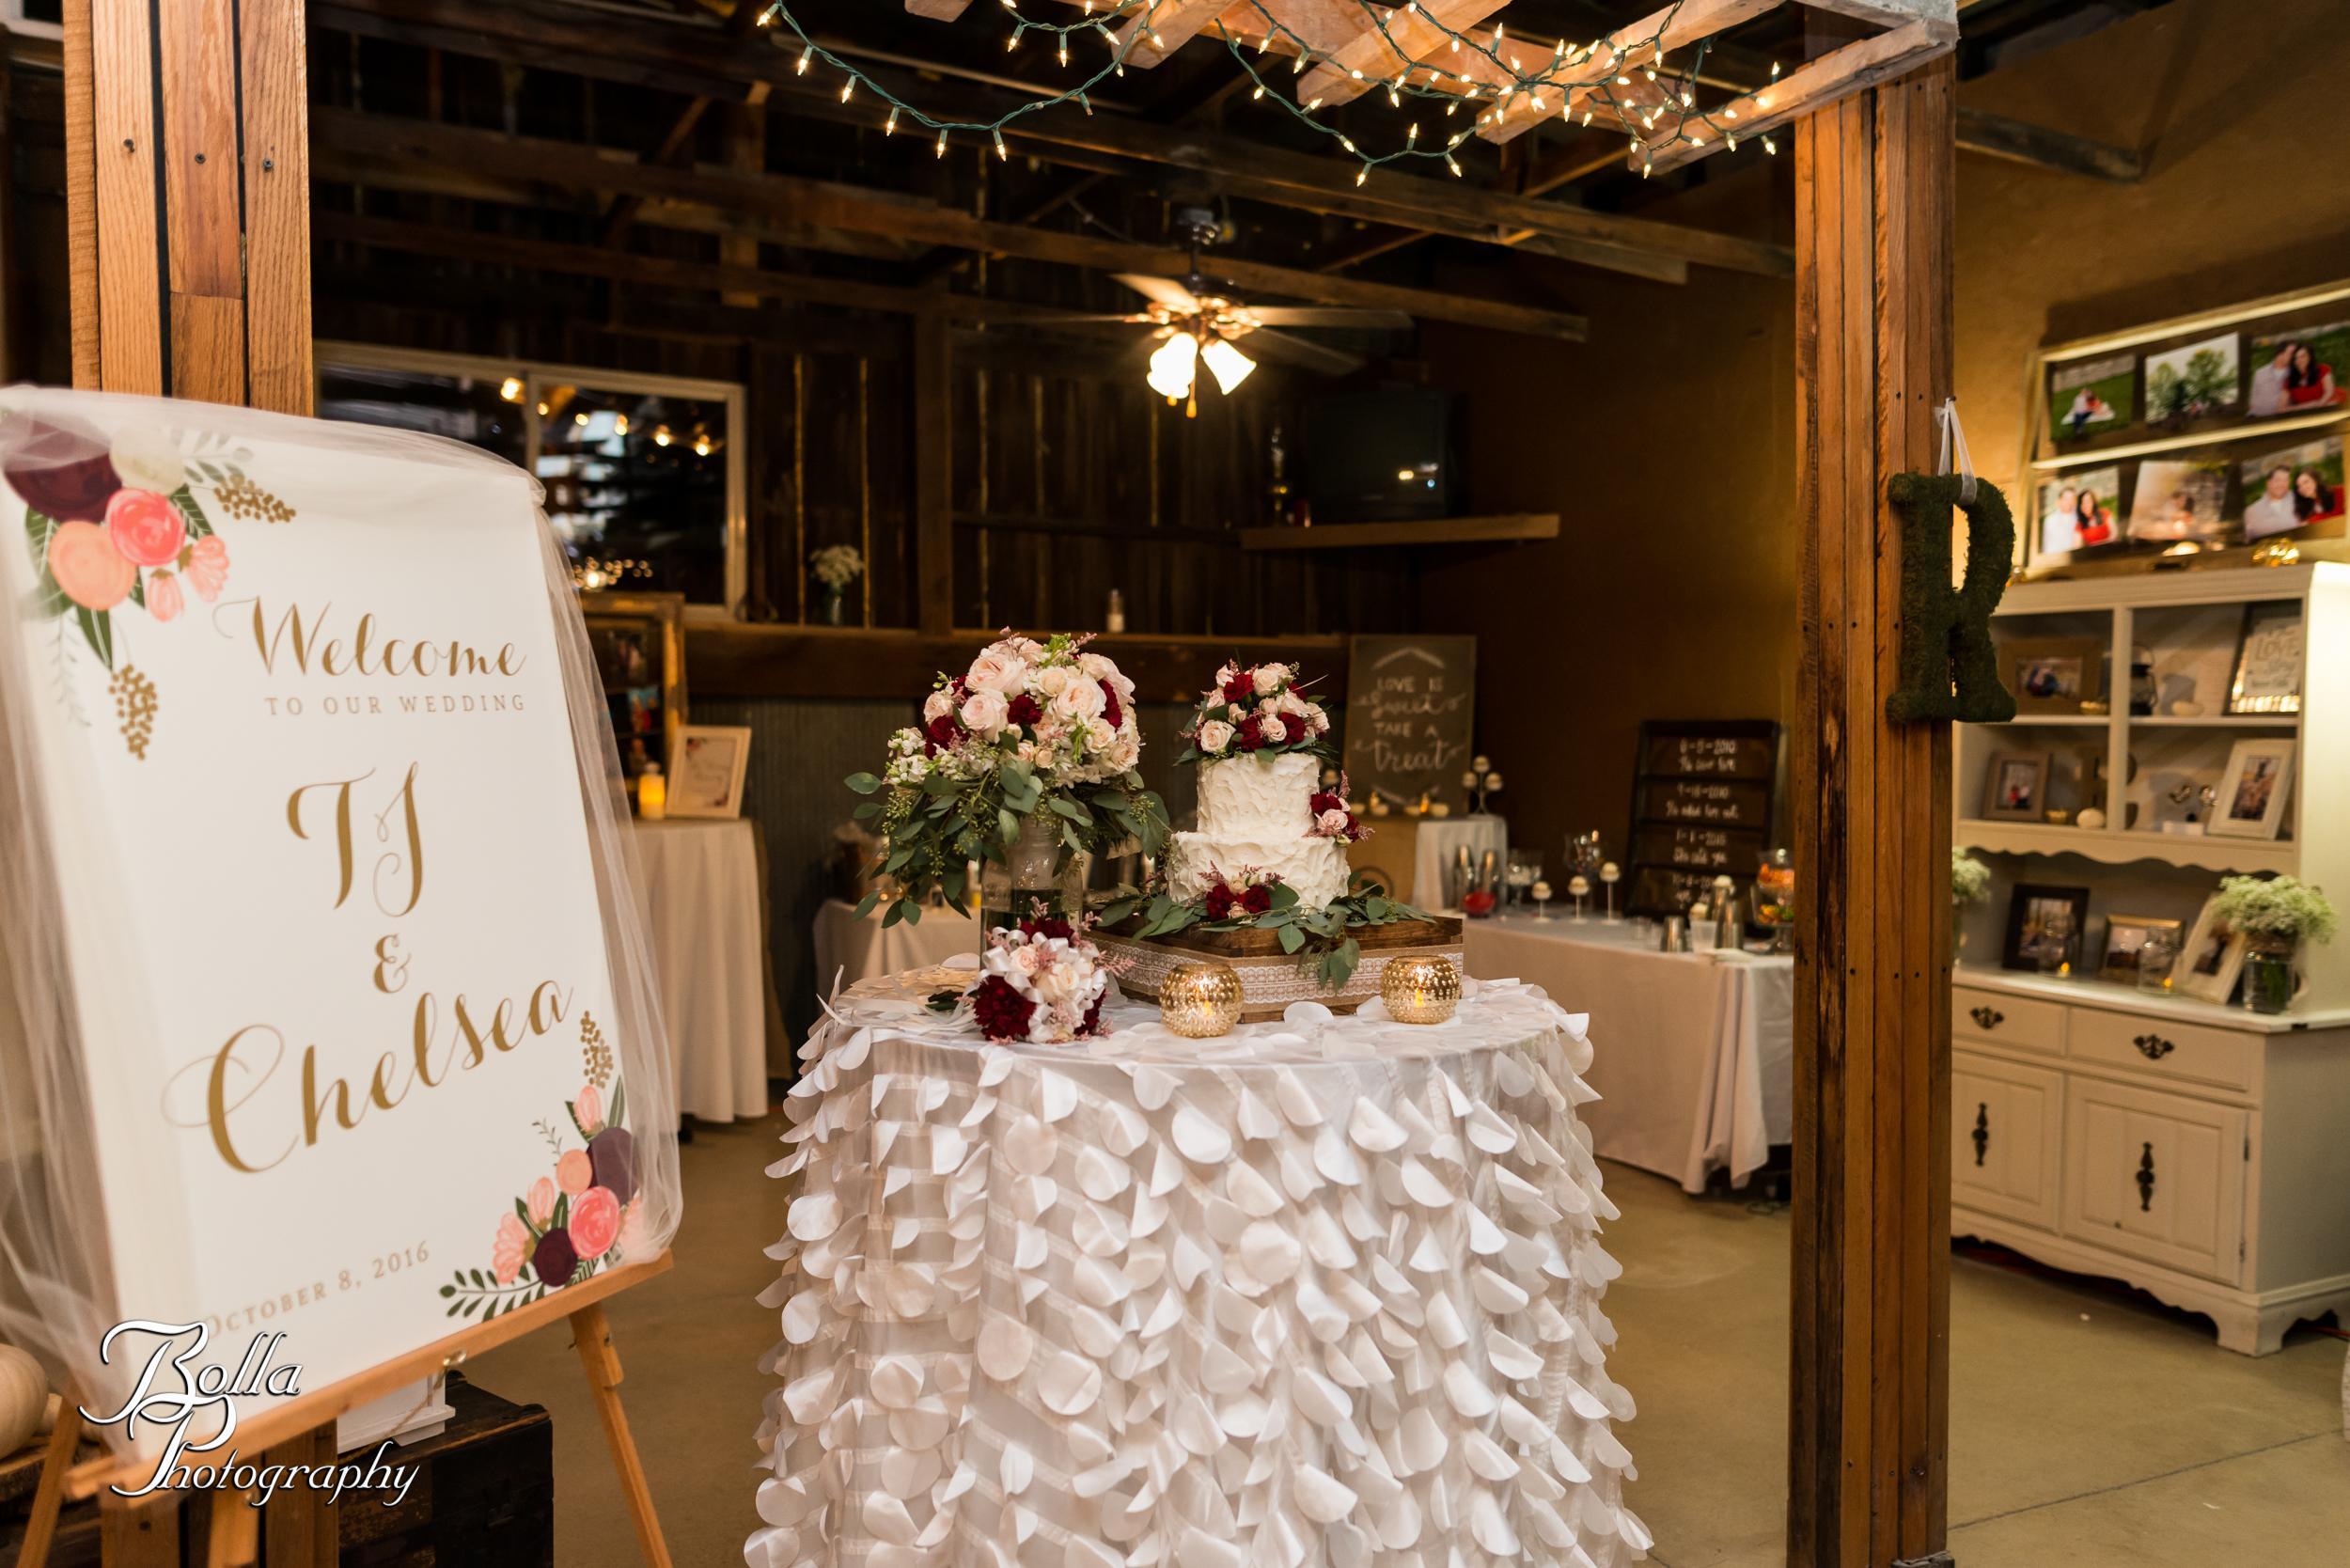 Bolla_photography_edwardsville_wedding_photographer_st_louis_weddings_Reilmann-0421.jpg